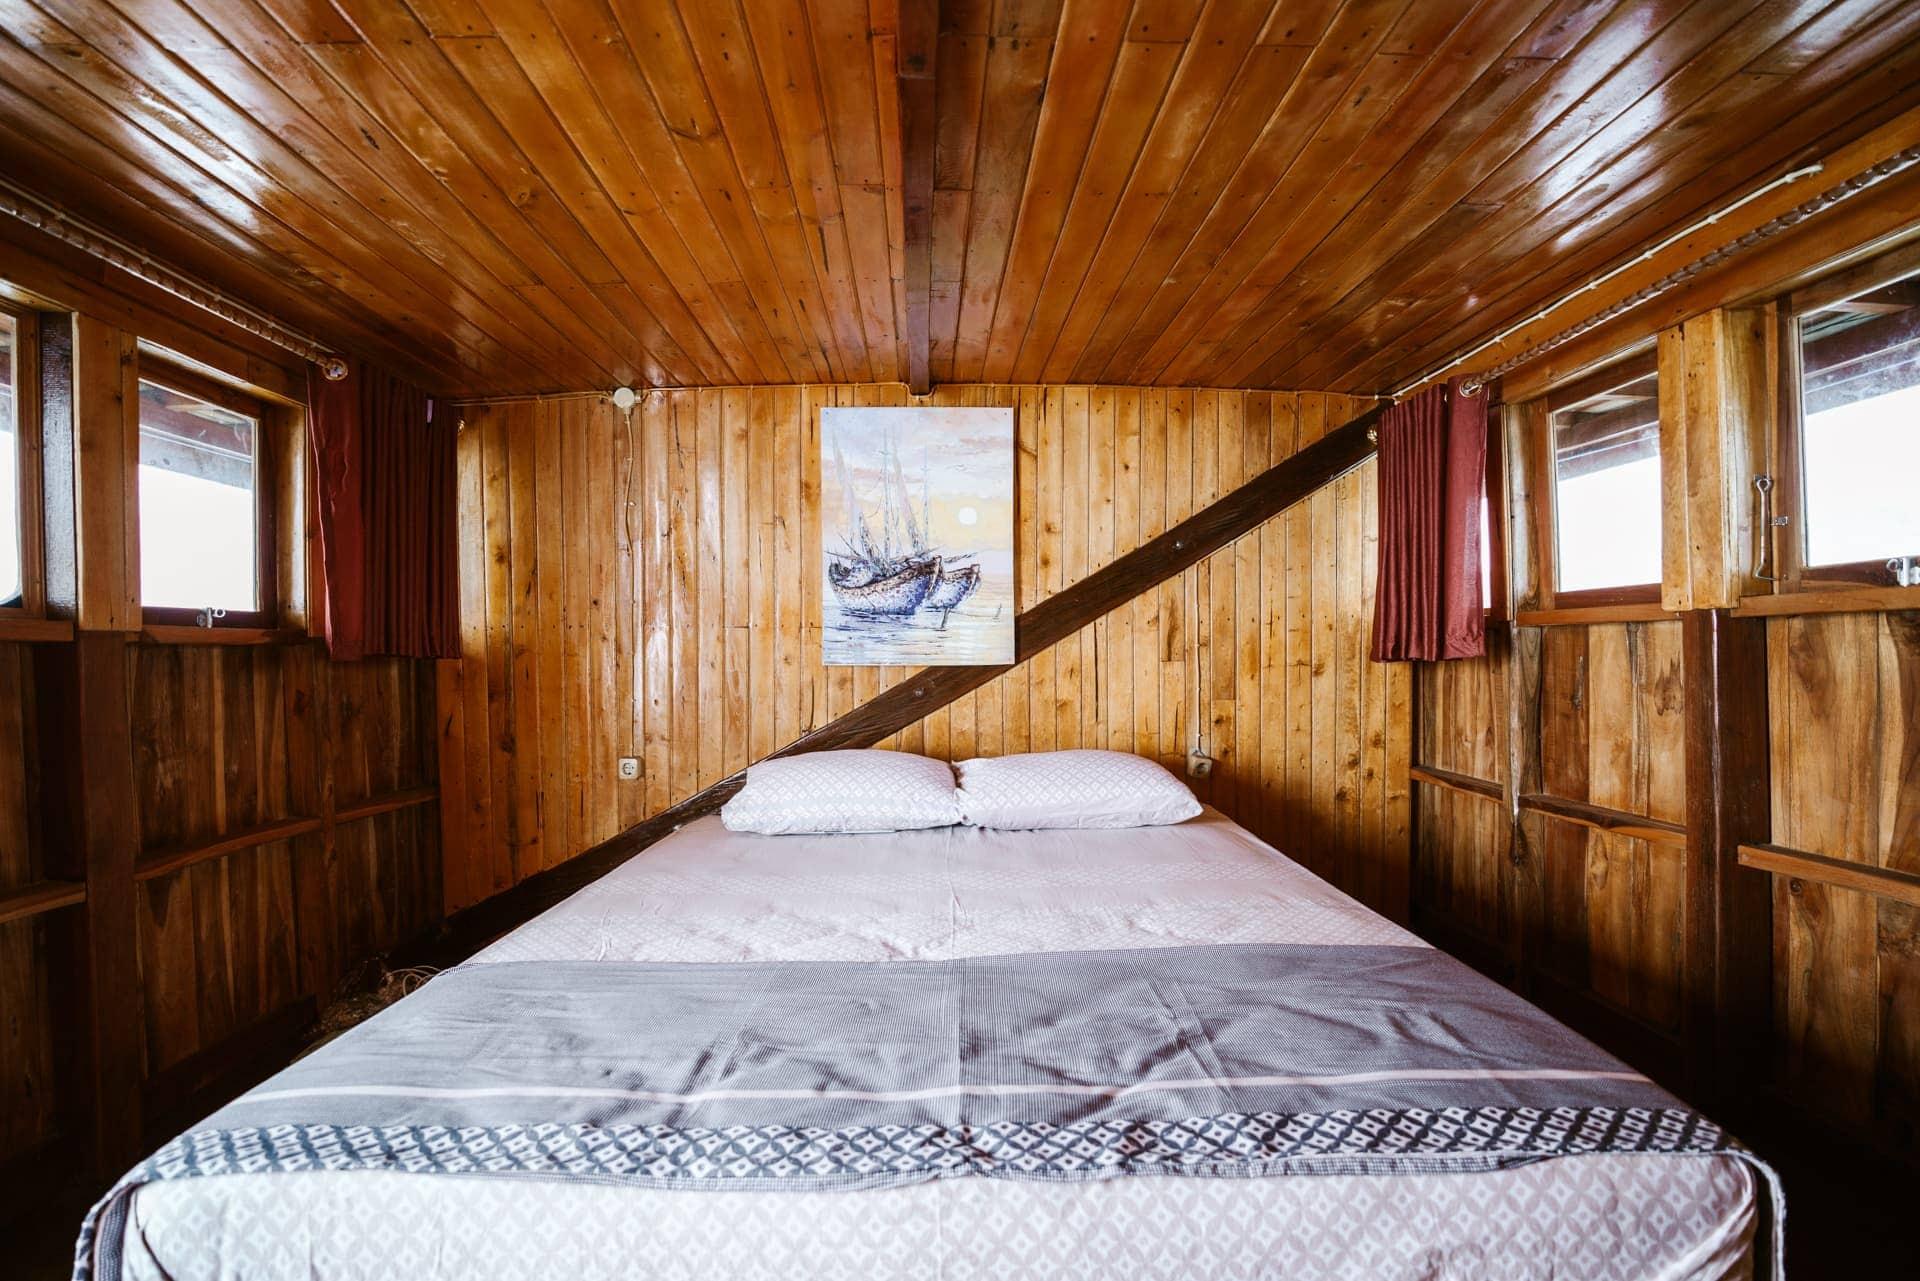 komodo boat tour bed